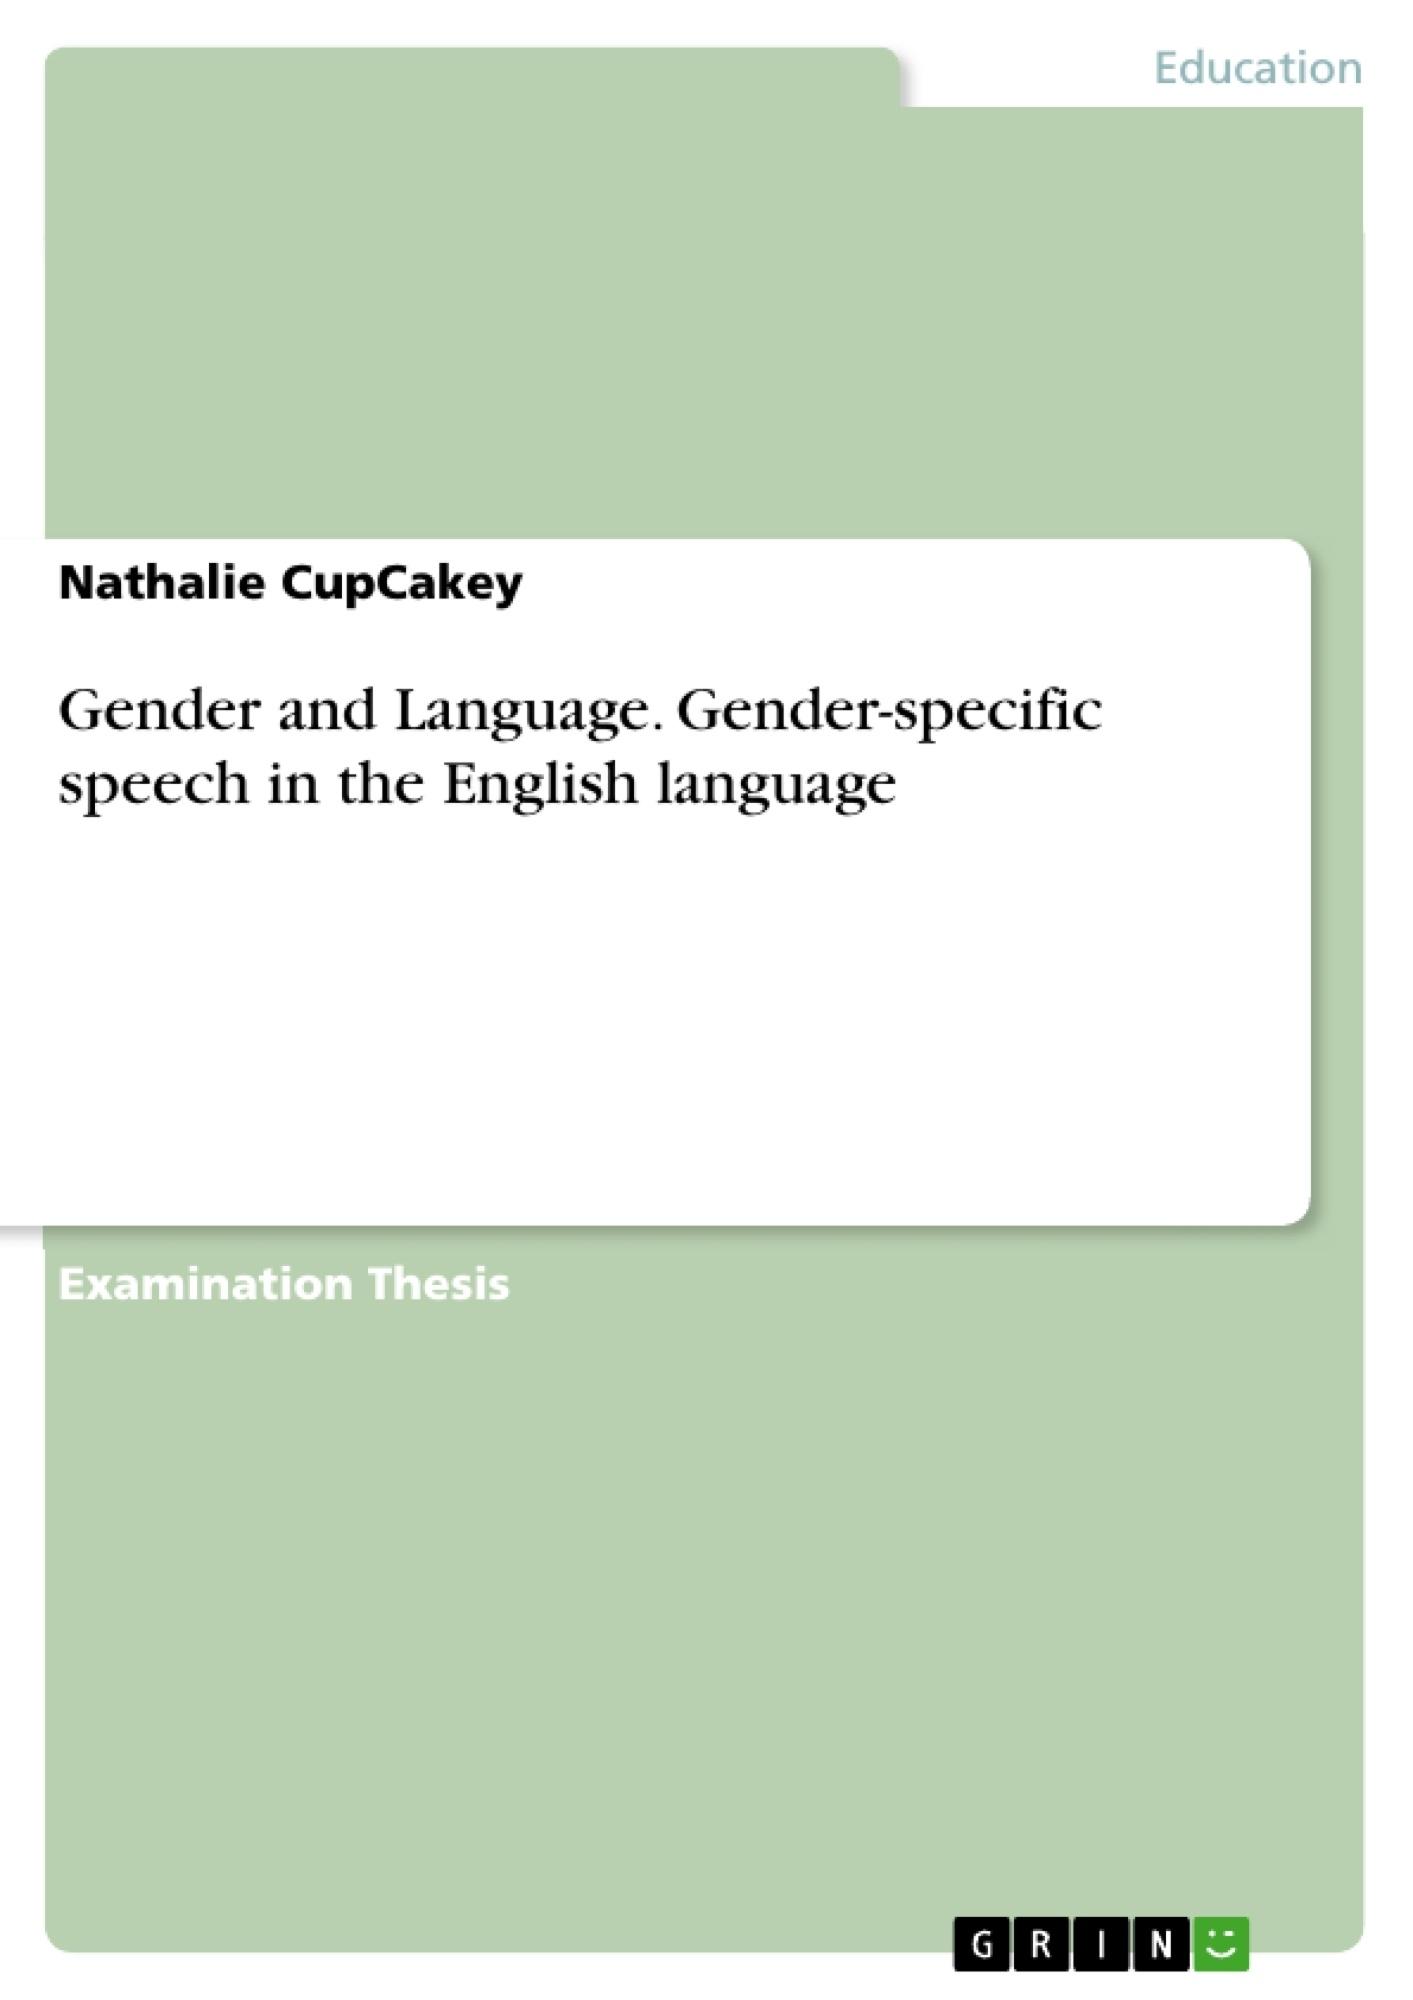 english language and gender essay